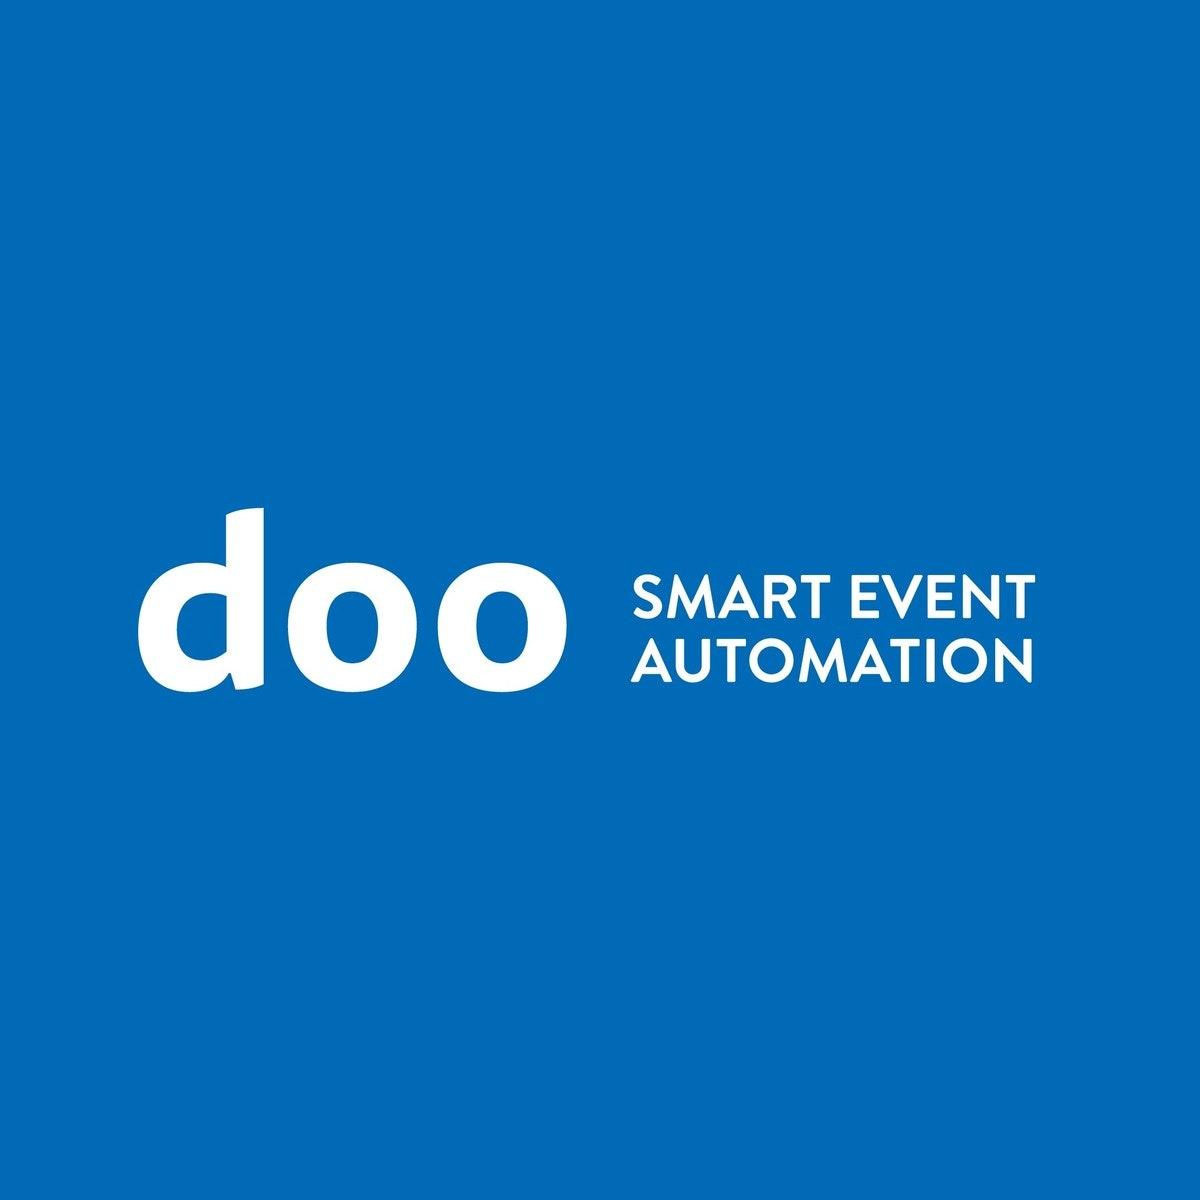 doo GmbH